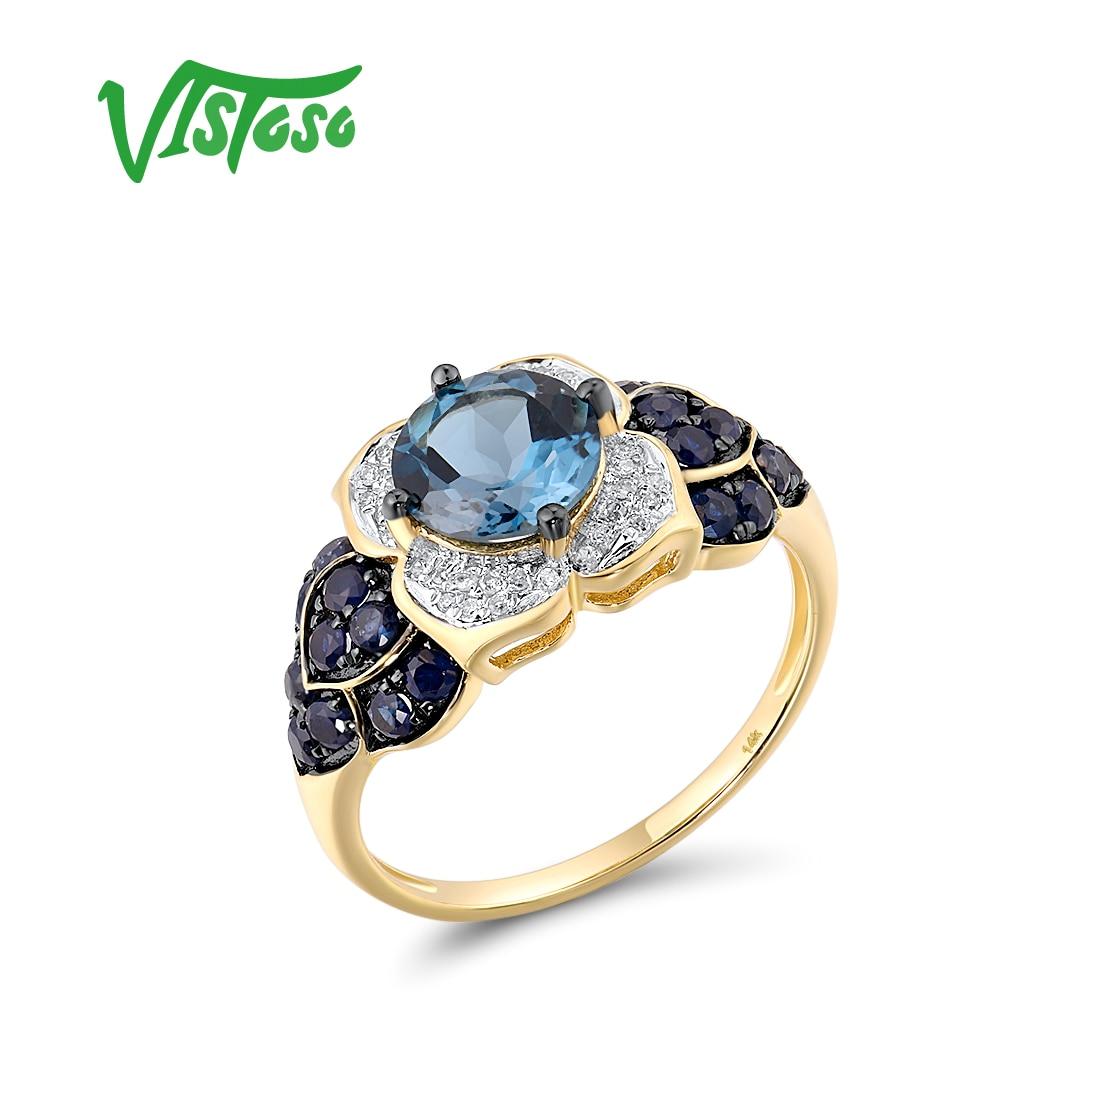 VISTOSO خاتم ذهبي للمرأة نقية 14K 585 الذهب الأصفر تألق الطبيعية لندن الأزرق توباز الياقوت الماس براقة غرامة مجوهرات